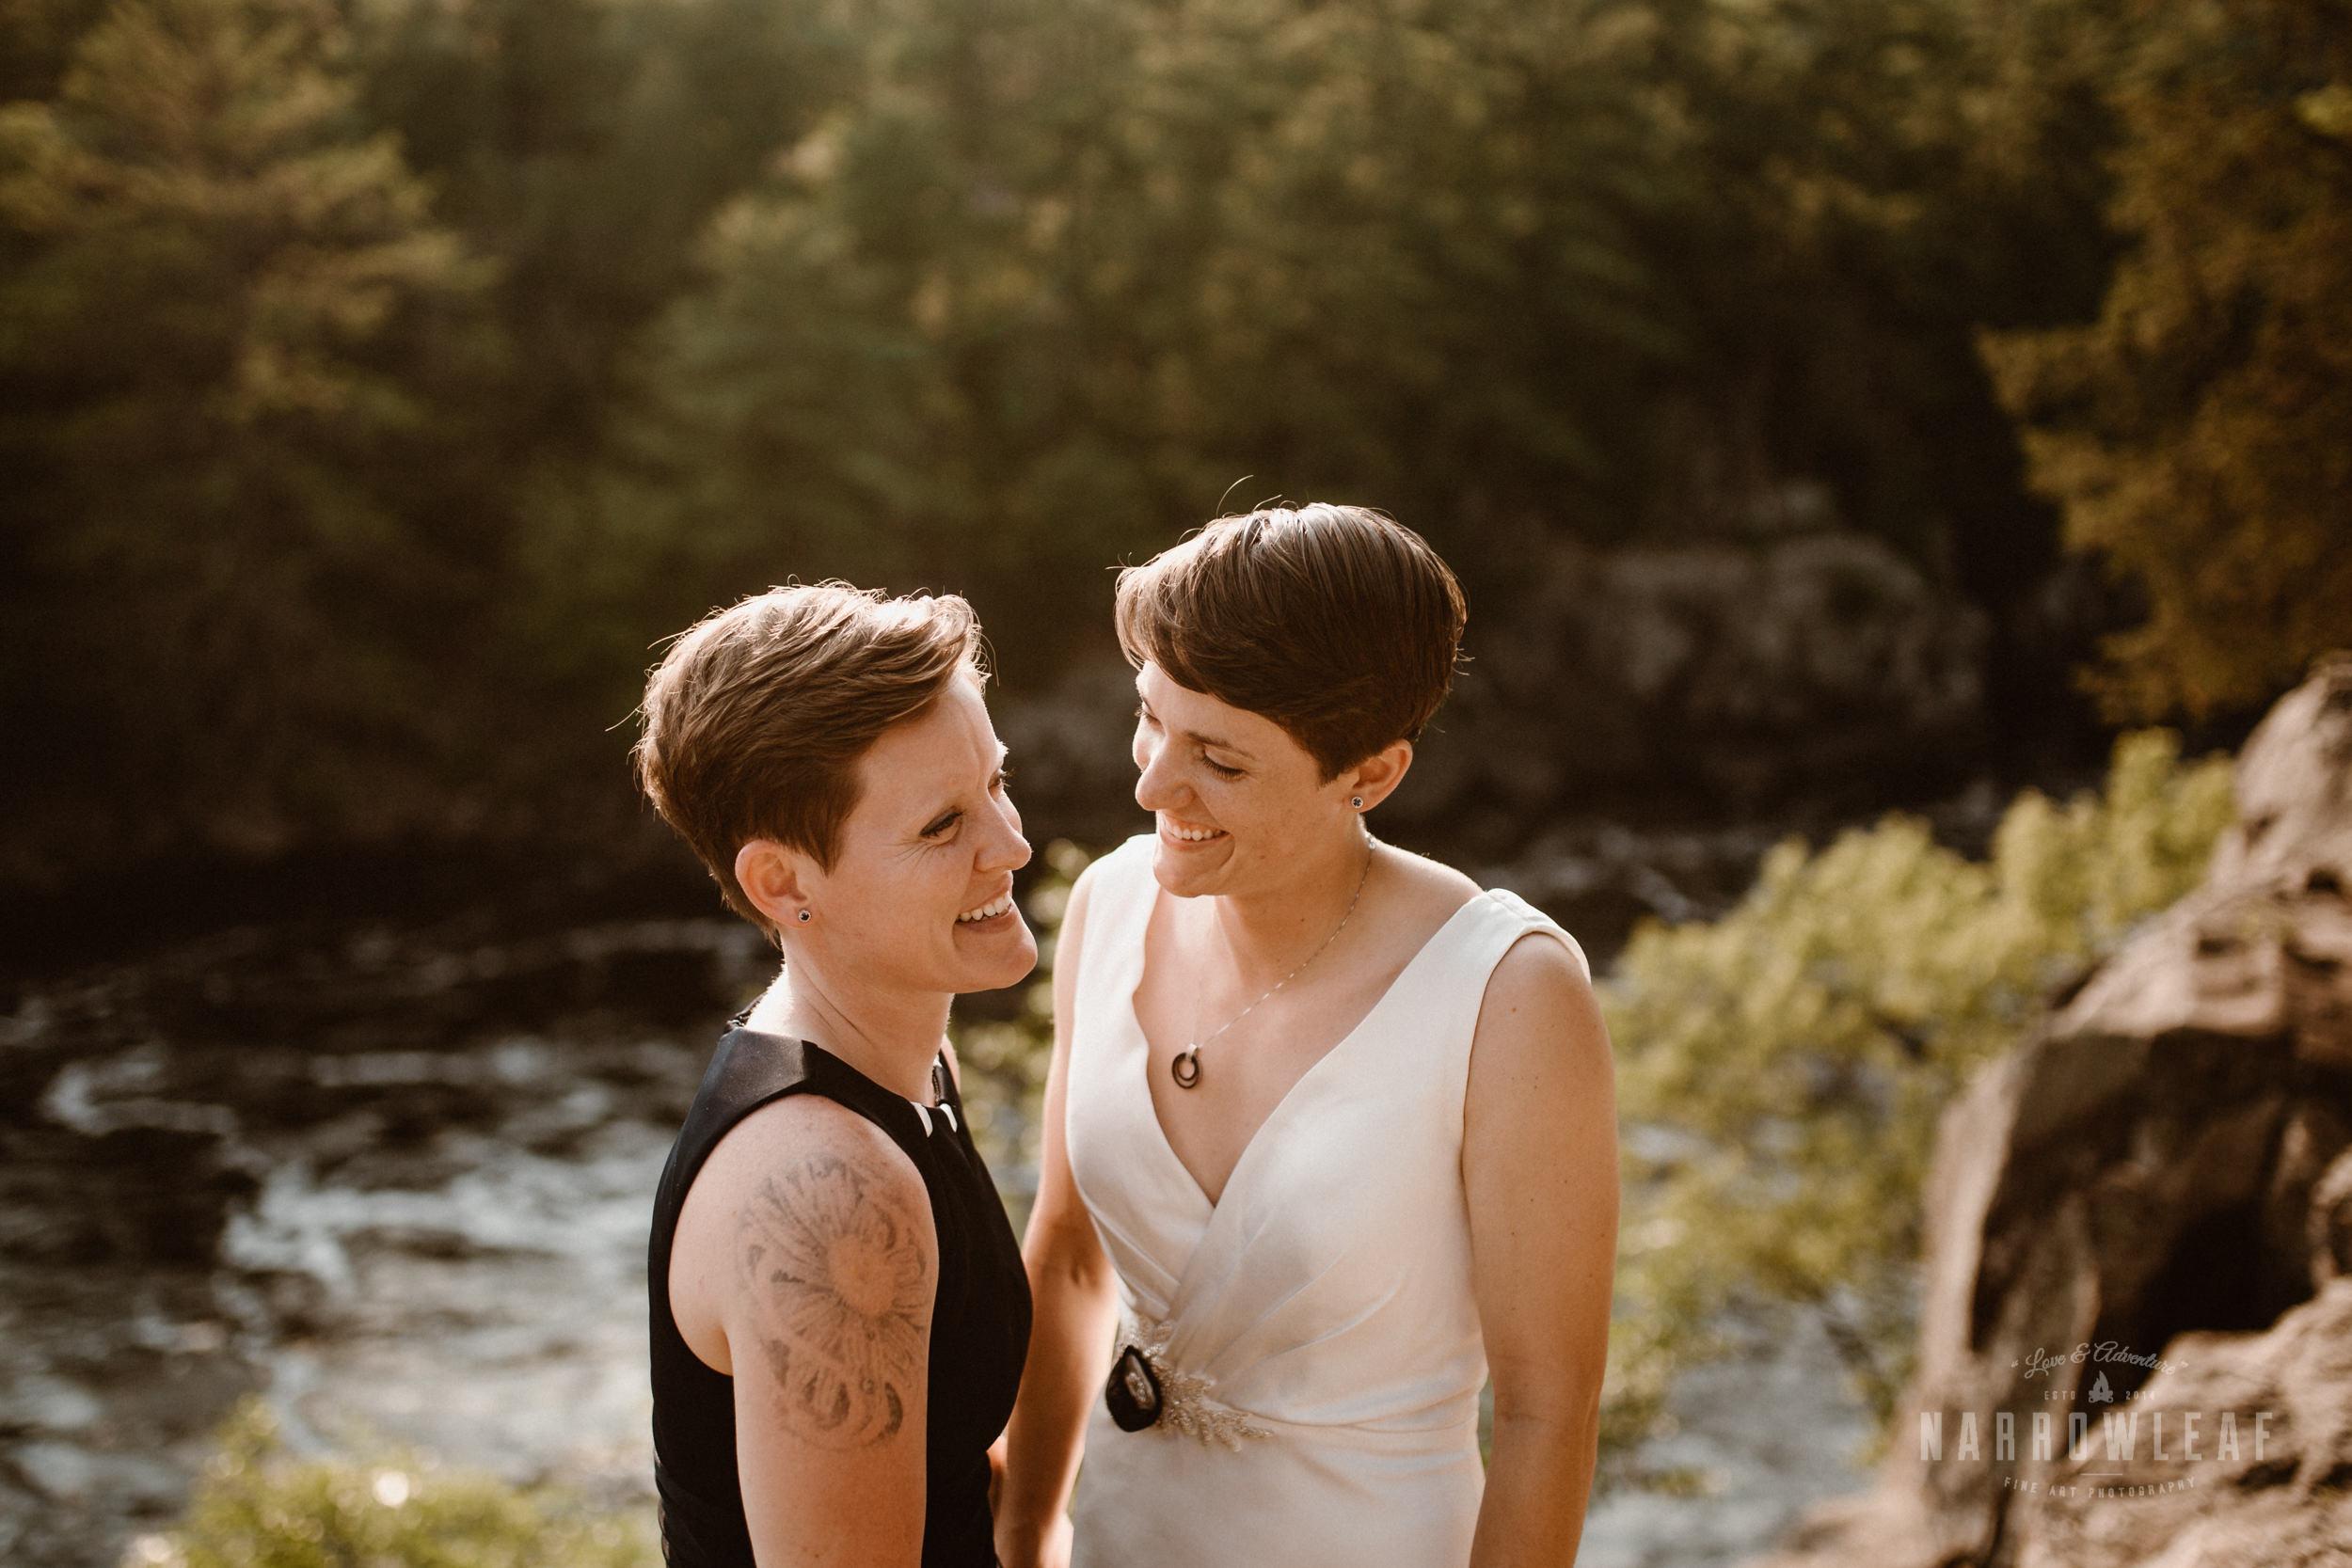 Interstate-Park-Taylors-Falls-Minnesota-Elopement-Photographer-Narrowleaf_Love_and_Adventure_Photography-3882.jpg